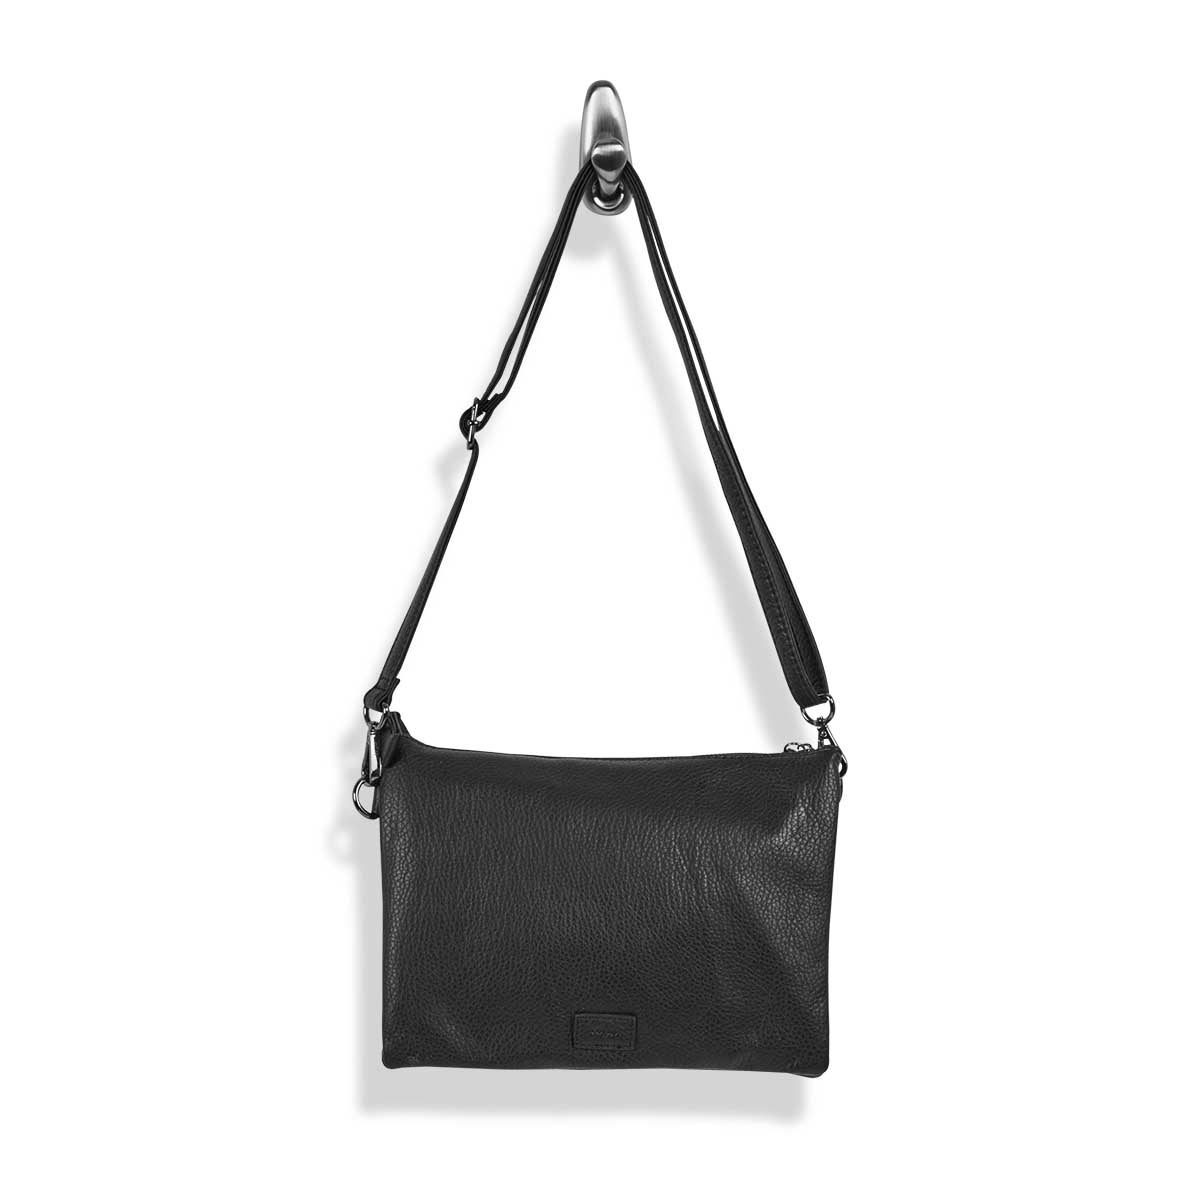 Lds Loft Flat blk wristlet/crossbody bag